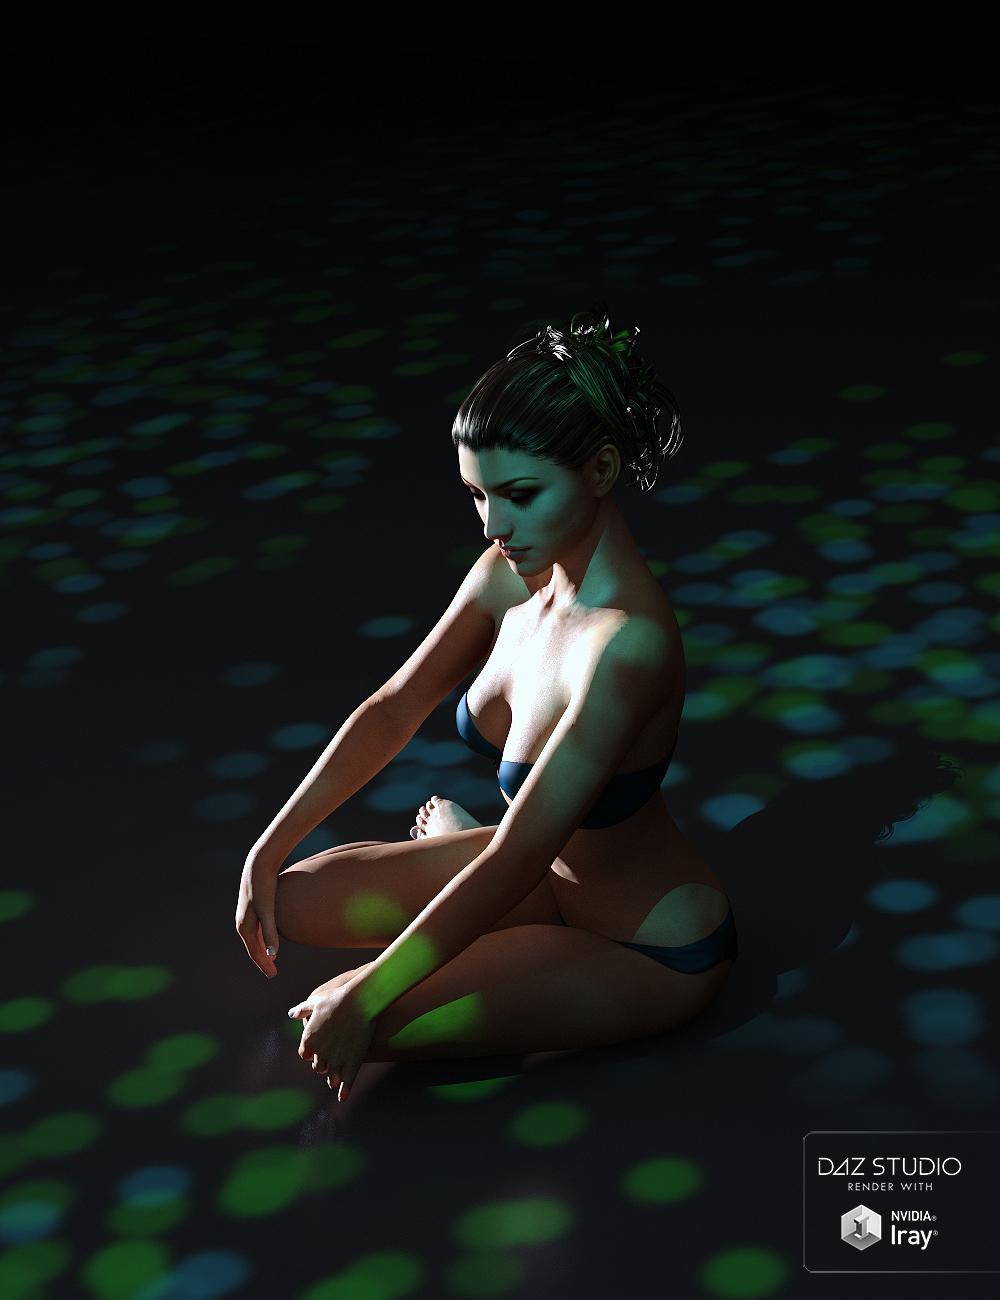 Gobo Lights for DAZ Studio Iray by: ForbiddenWhispers, 3D Models by Daz 3D